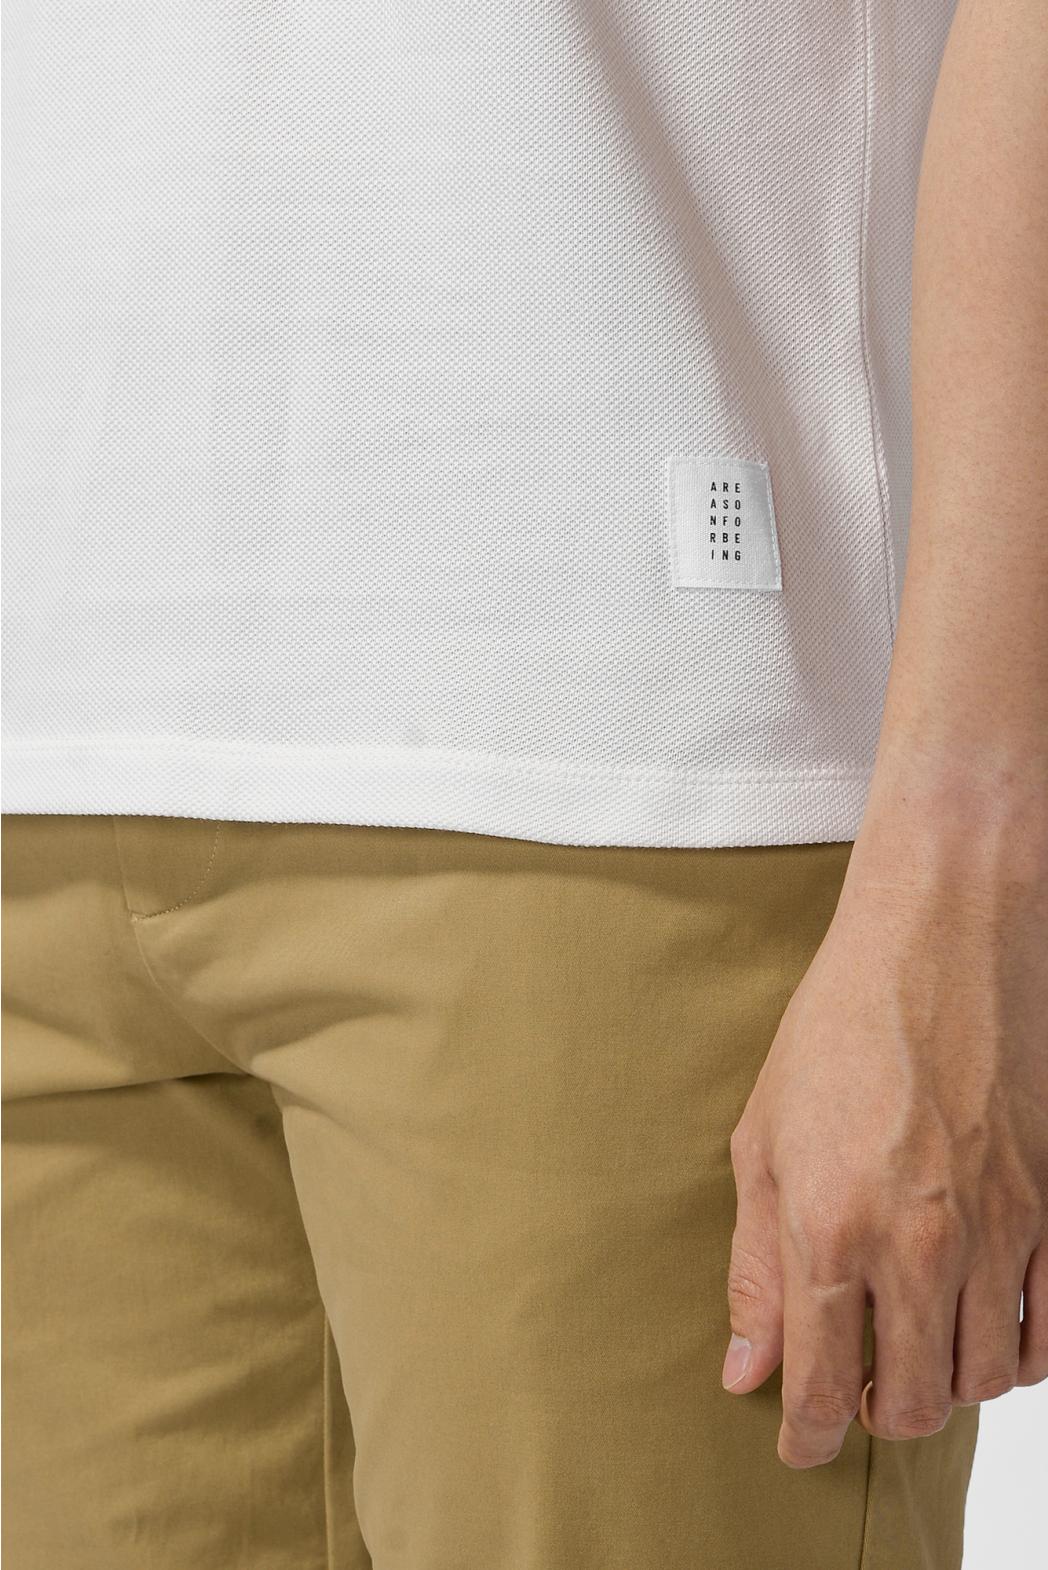 Áo Polo nẹp có nút, Point Label. FITTED form - 10F20POL020